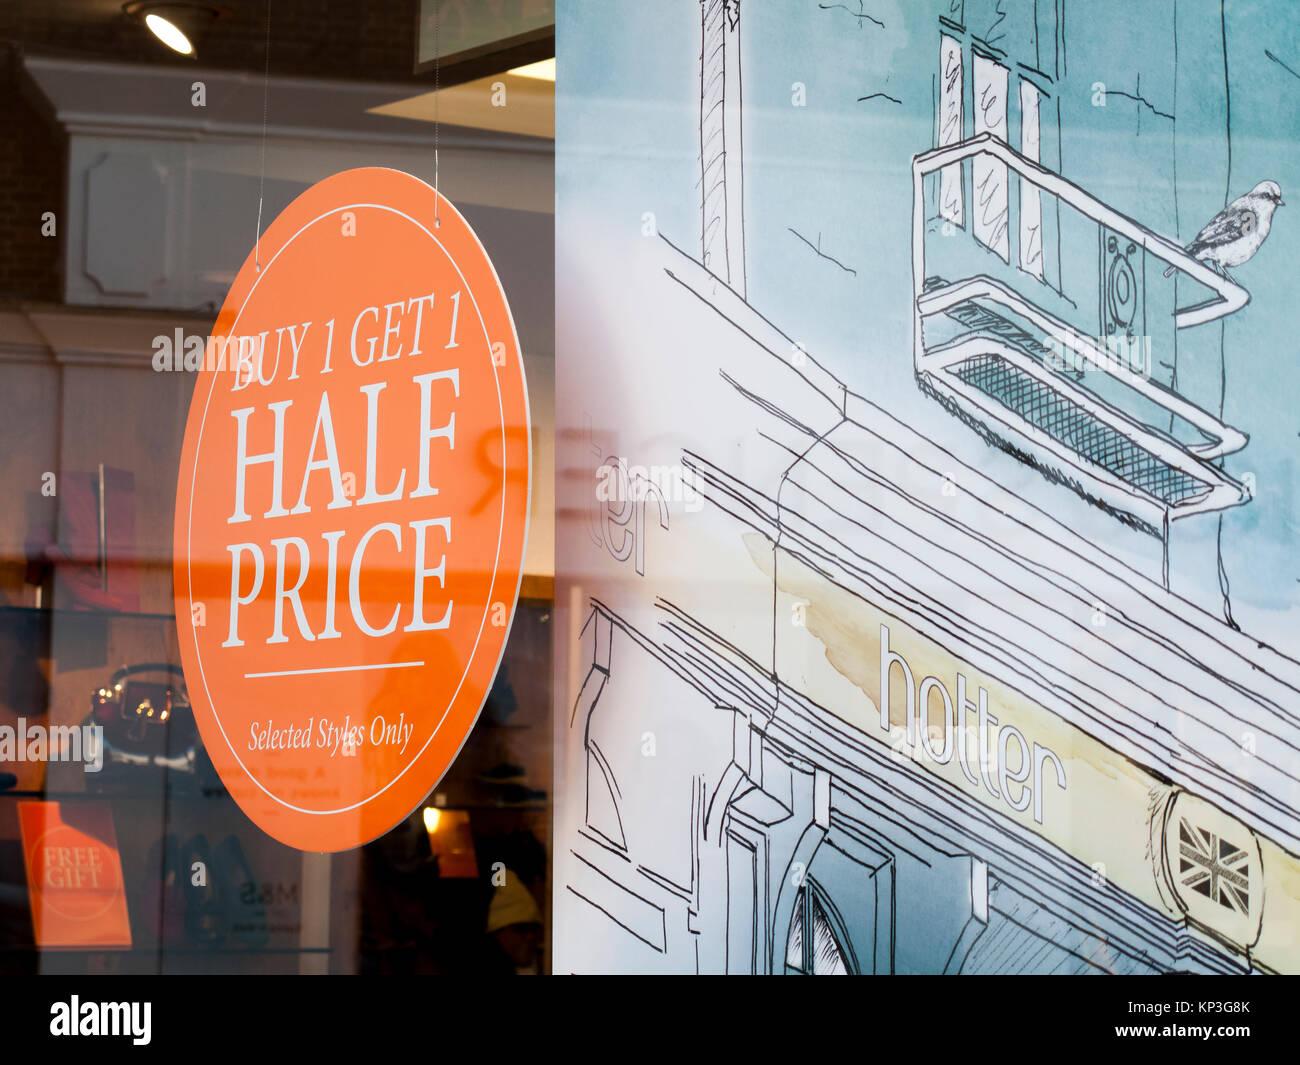 Hotter shoe shop window display advertising buy one get one half price - Stock Image